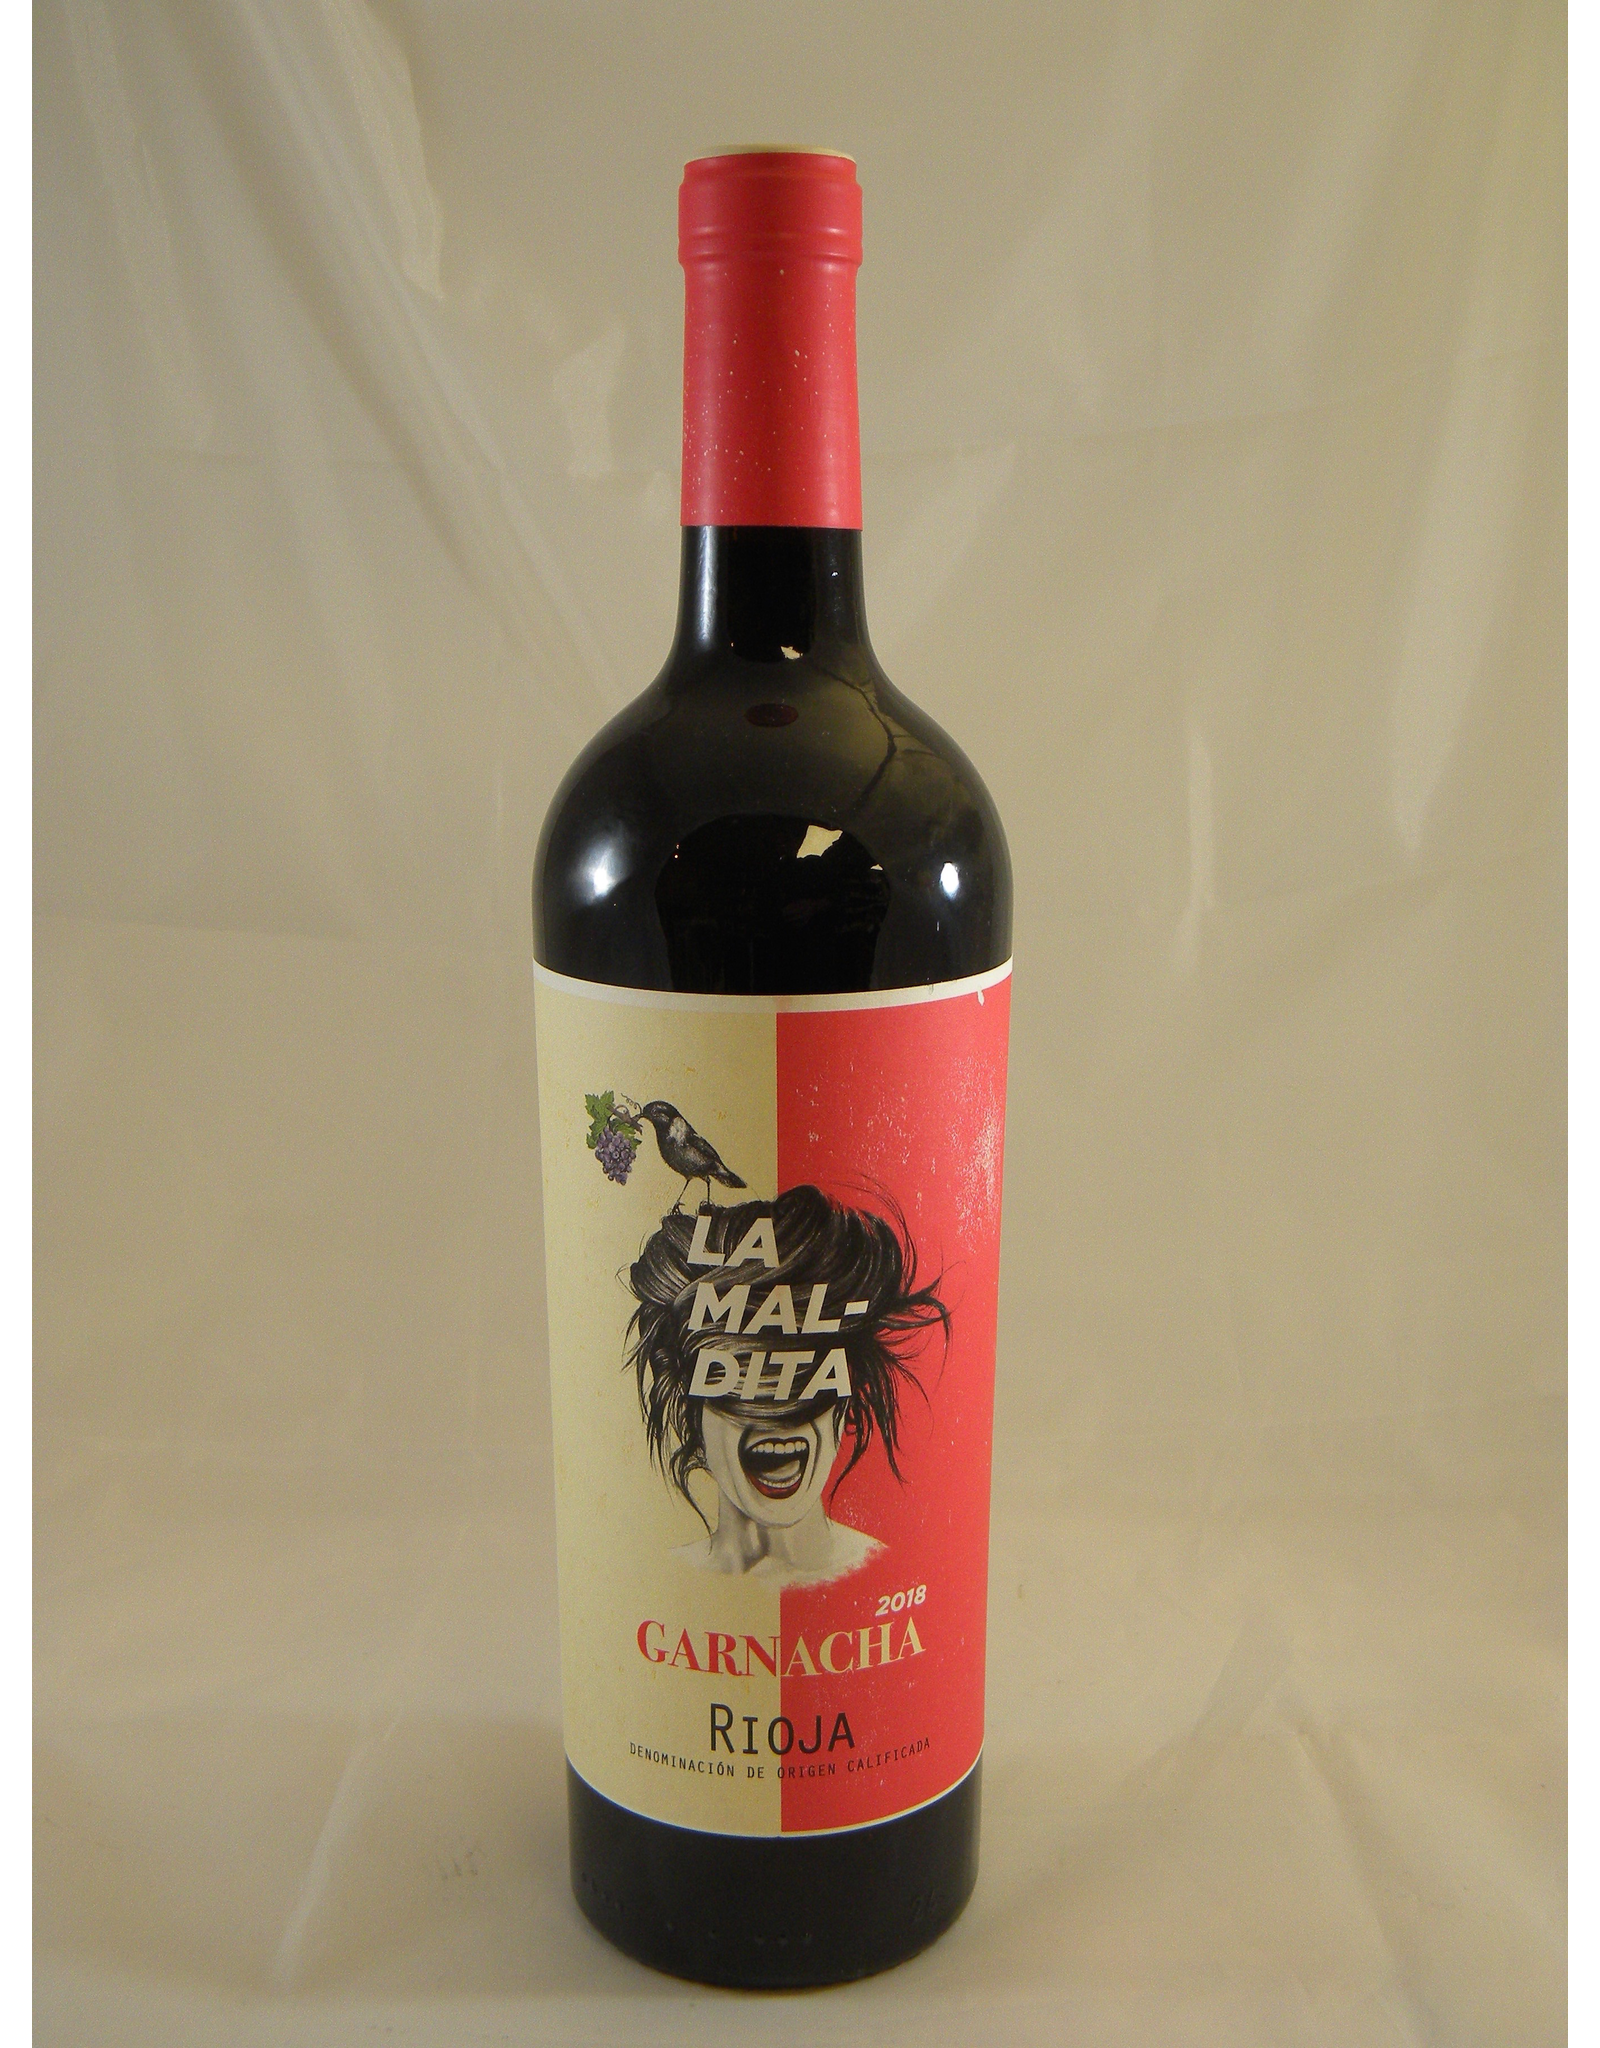 La Maldita La Maldita Rioja Grenache 2018